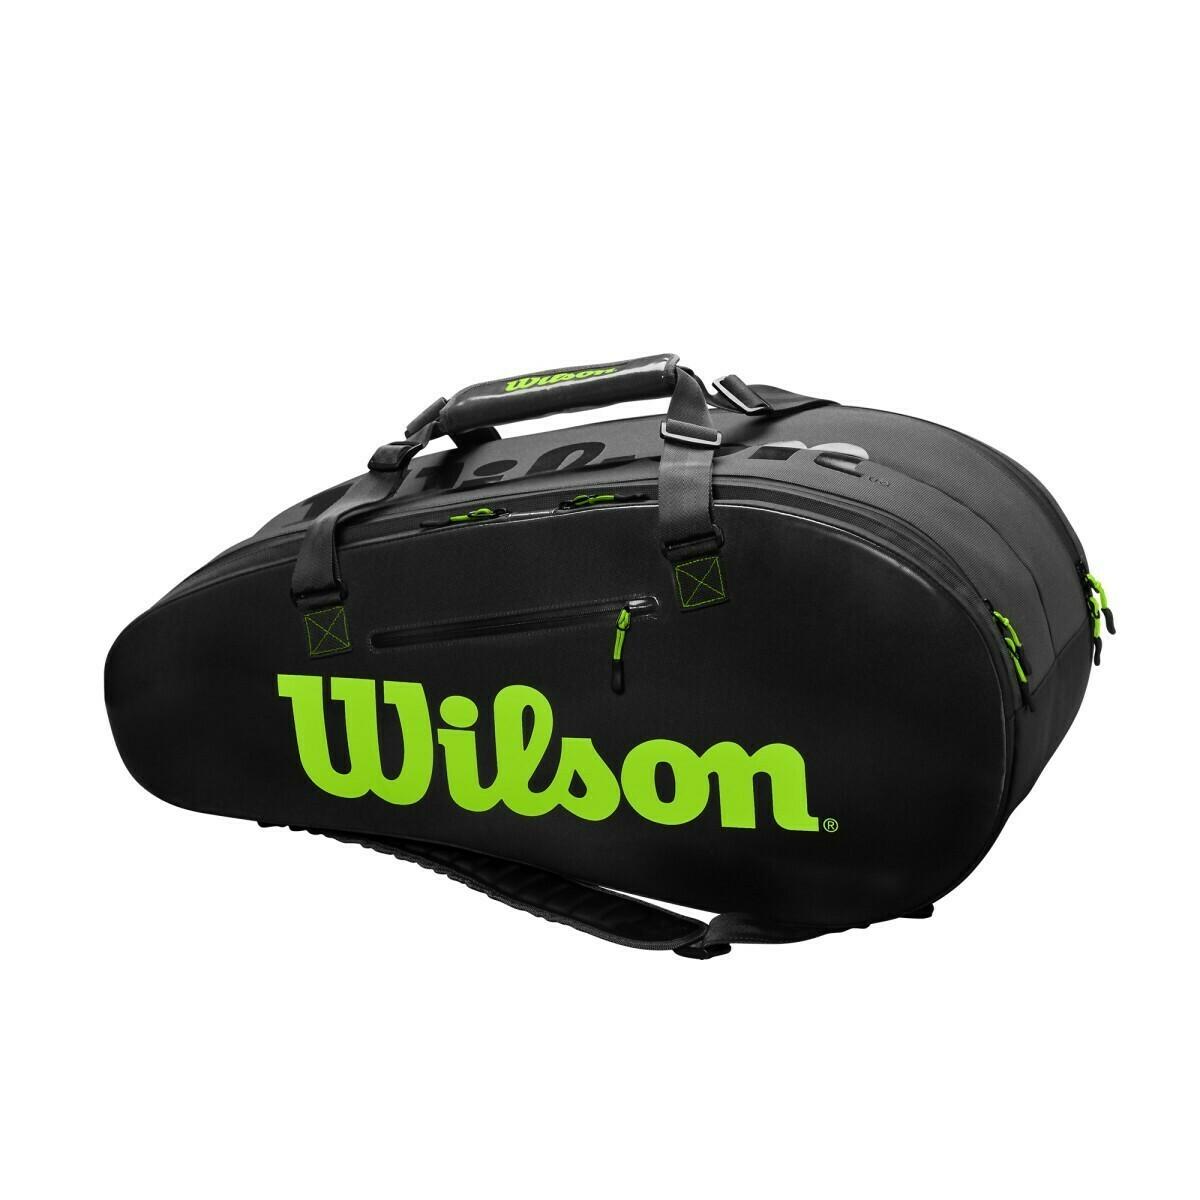 Wilson Super Tour 2 Comp Large Bag - Charcoal/Green